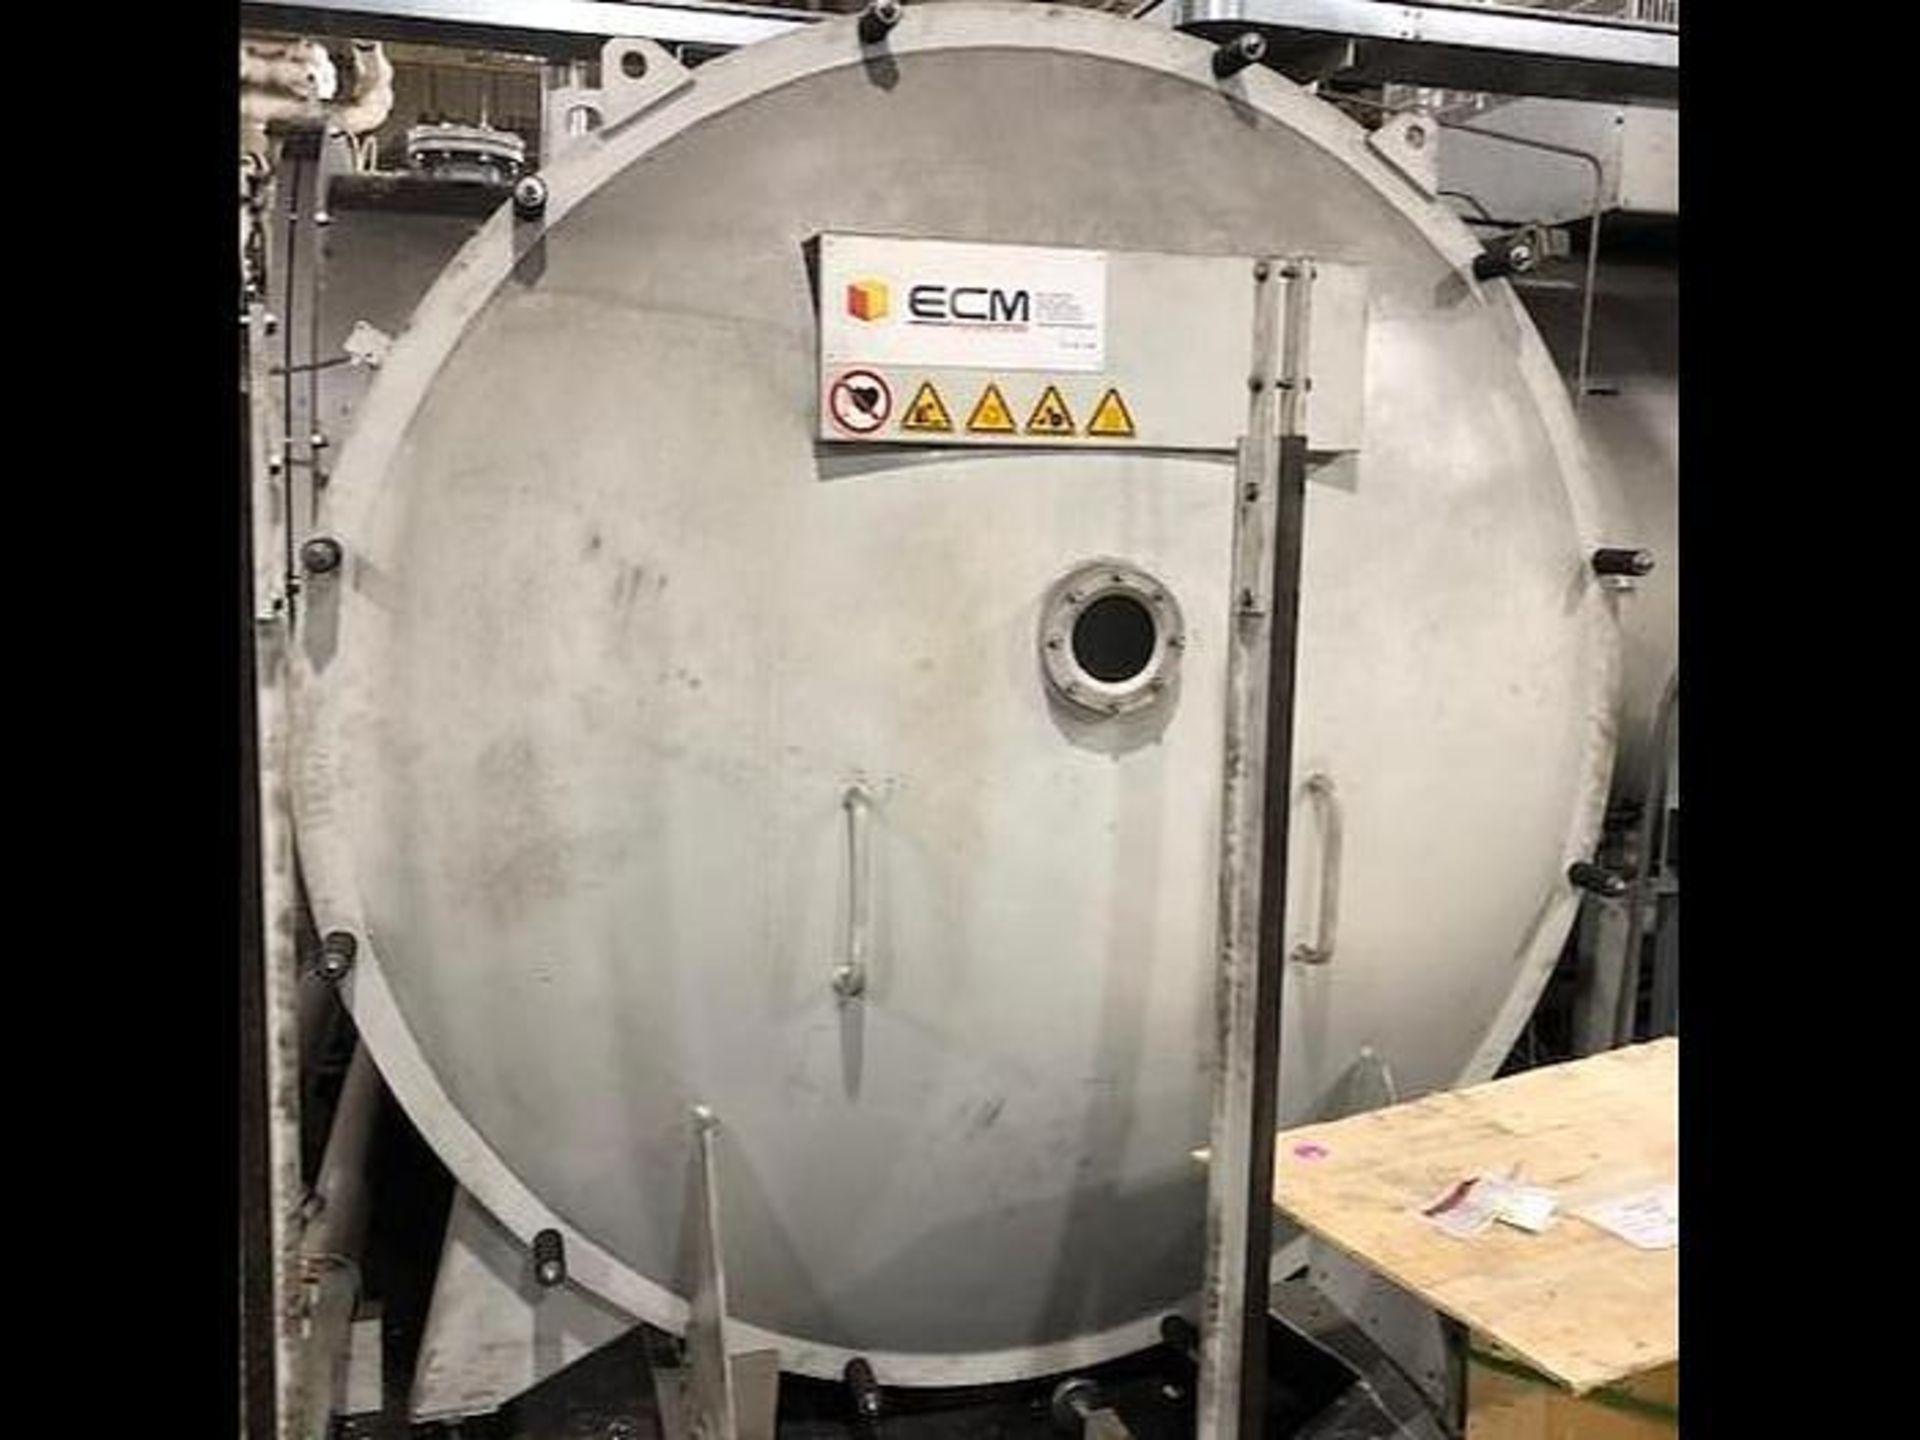 ECM TECHNOLOGIES VACUM CARBURIZING FURNACE, NEW 2013, SN 3100-500 - Image 17 of 50